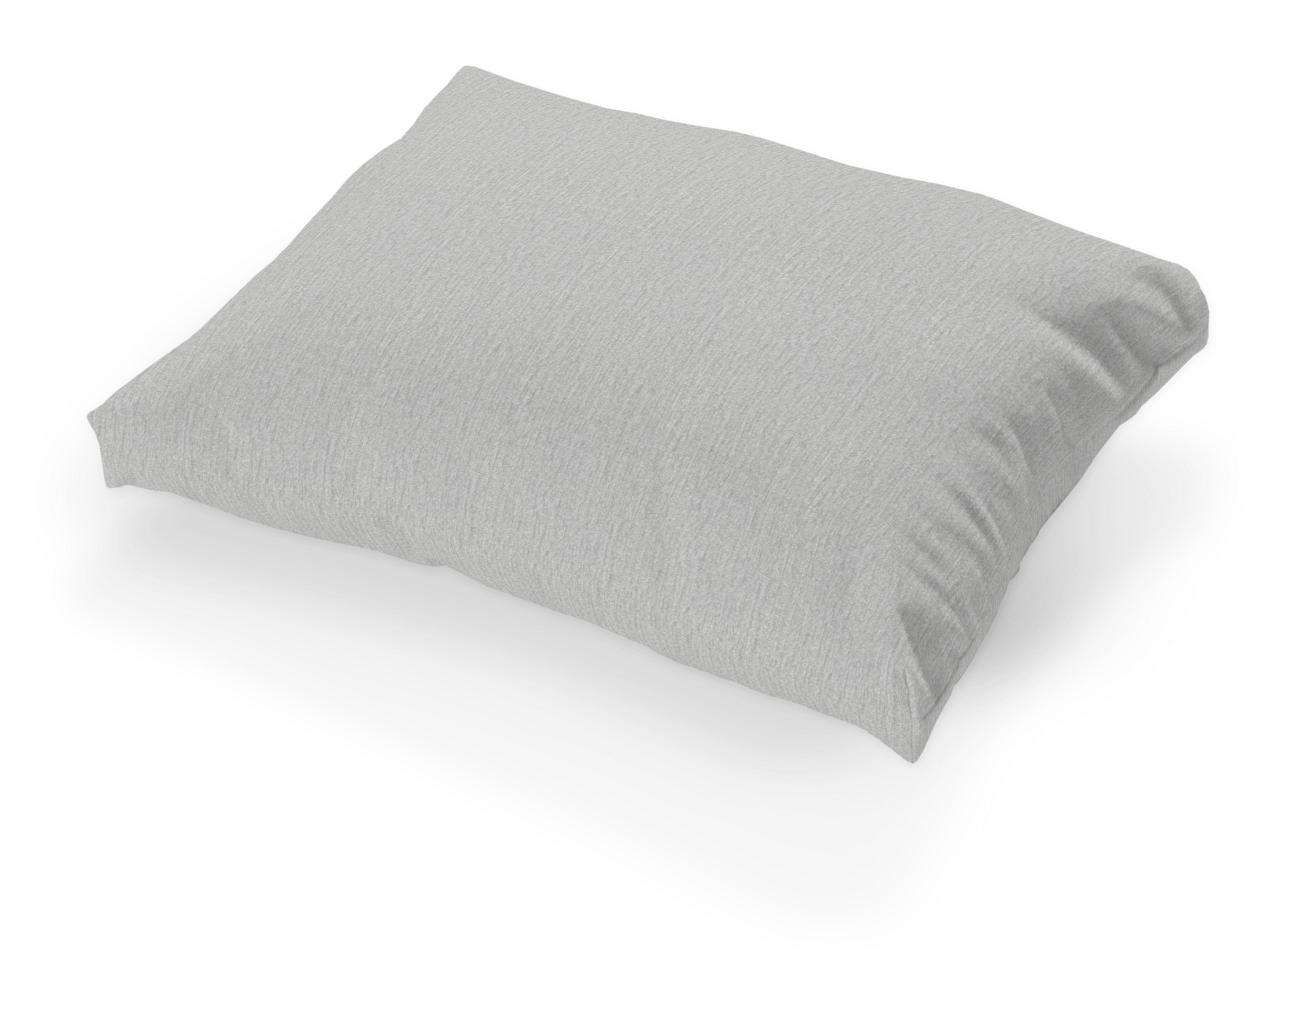 Tylösand pagalvėlės užvalkalas Tylösand pagalvėlė kolekcijoje Chenille, audinys: 702-23